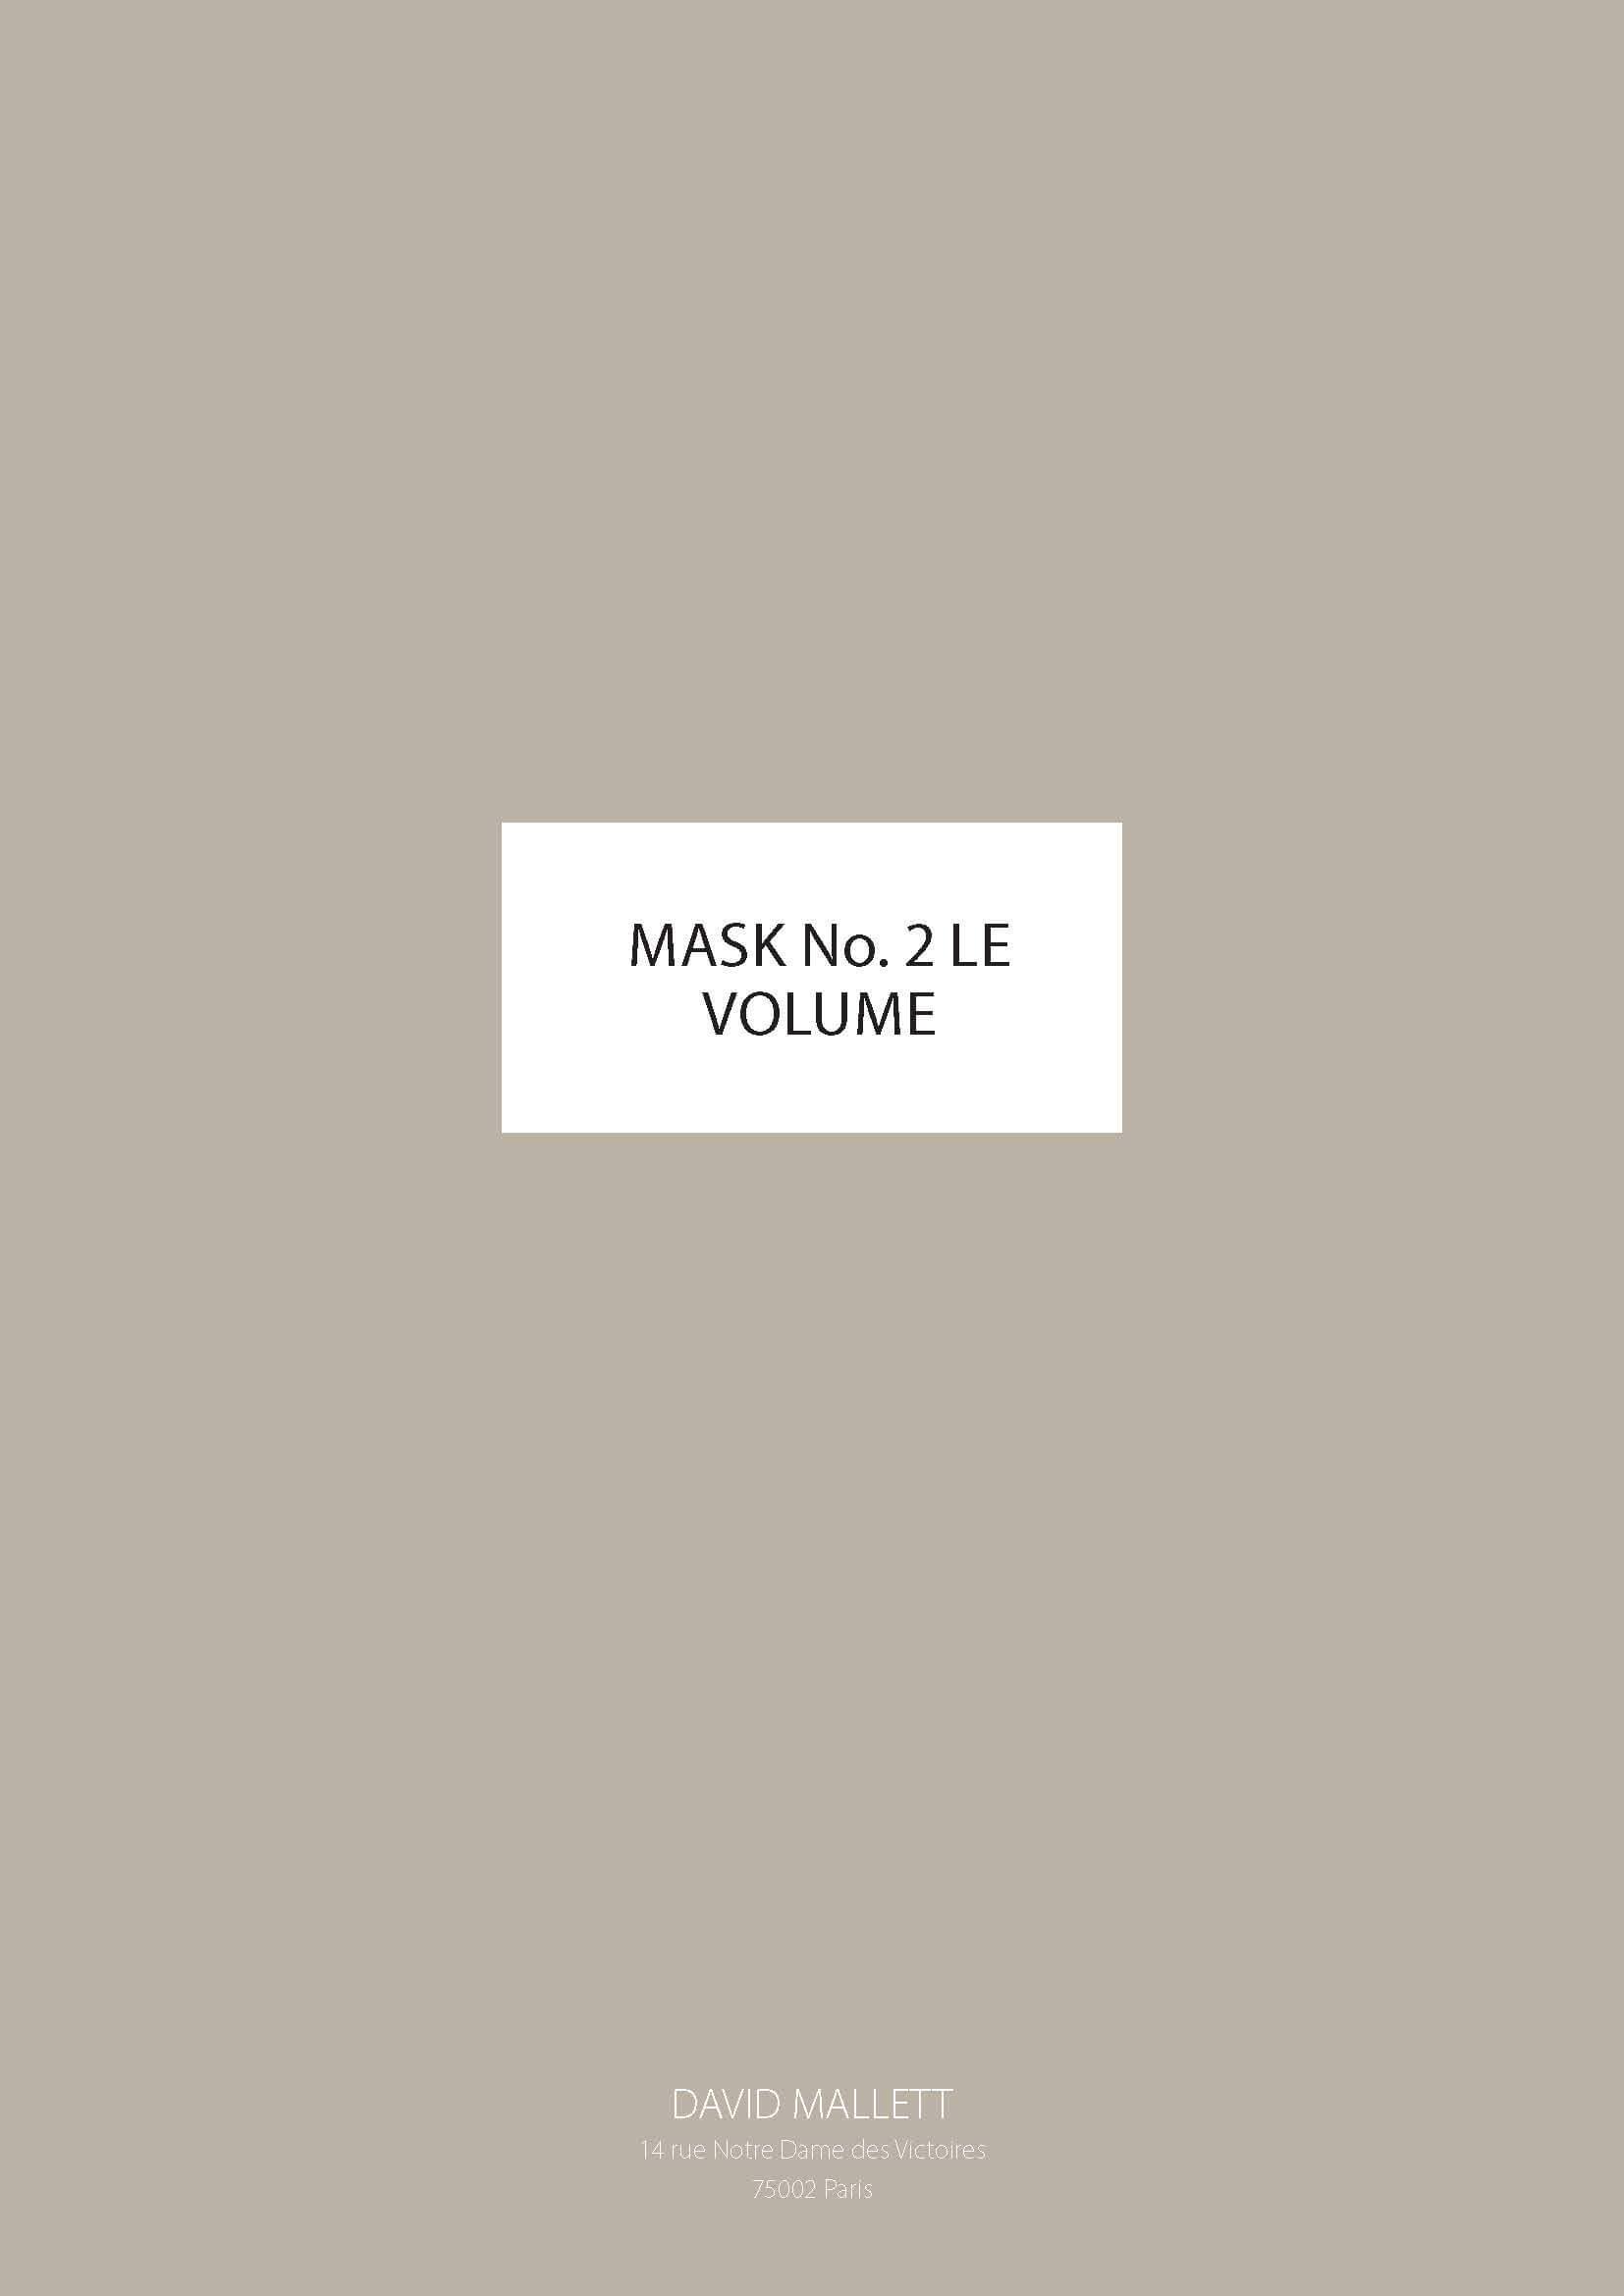 Mask No.2 LE VOLUME FR